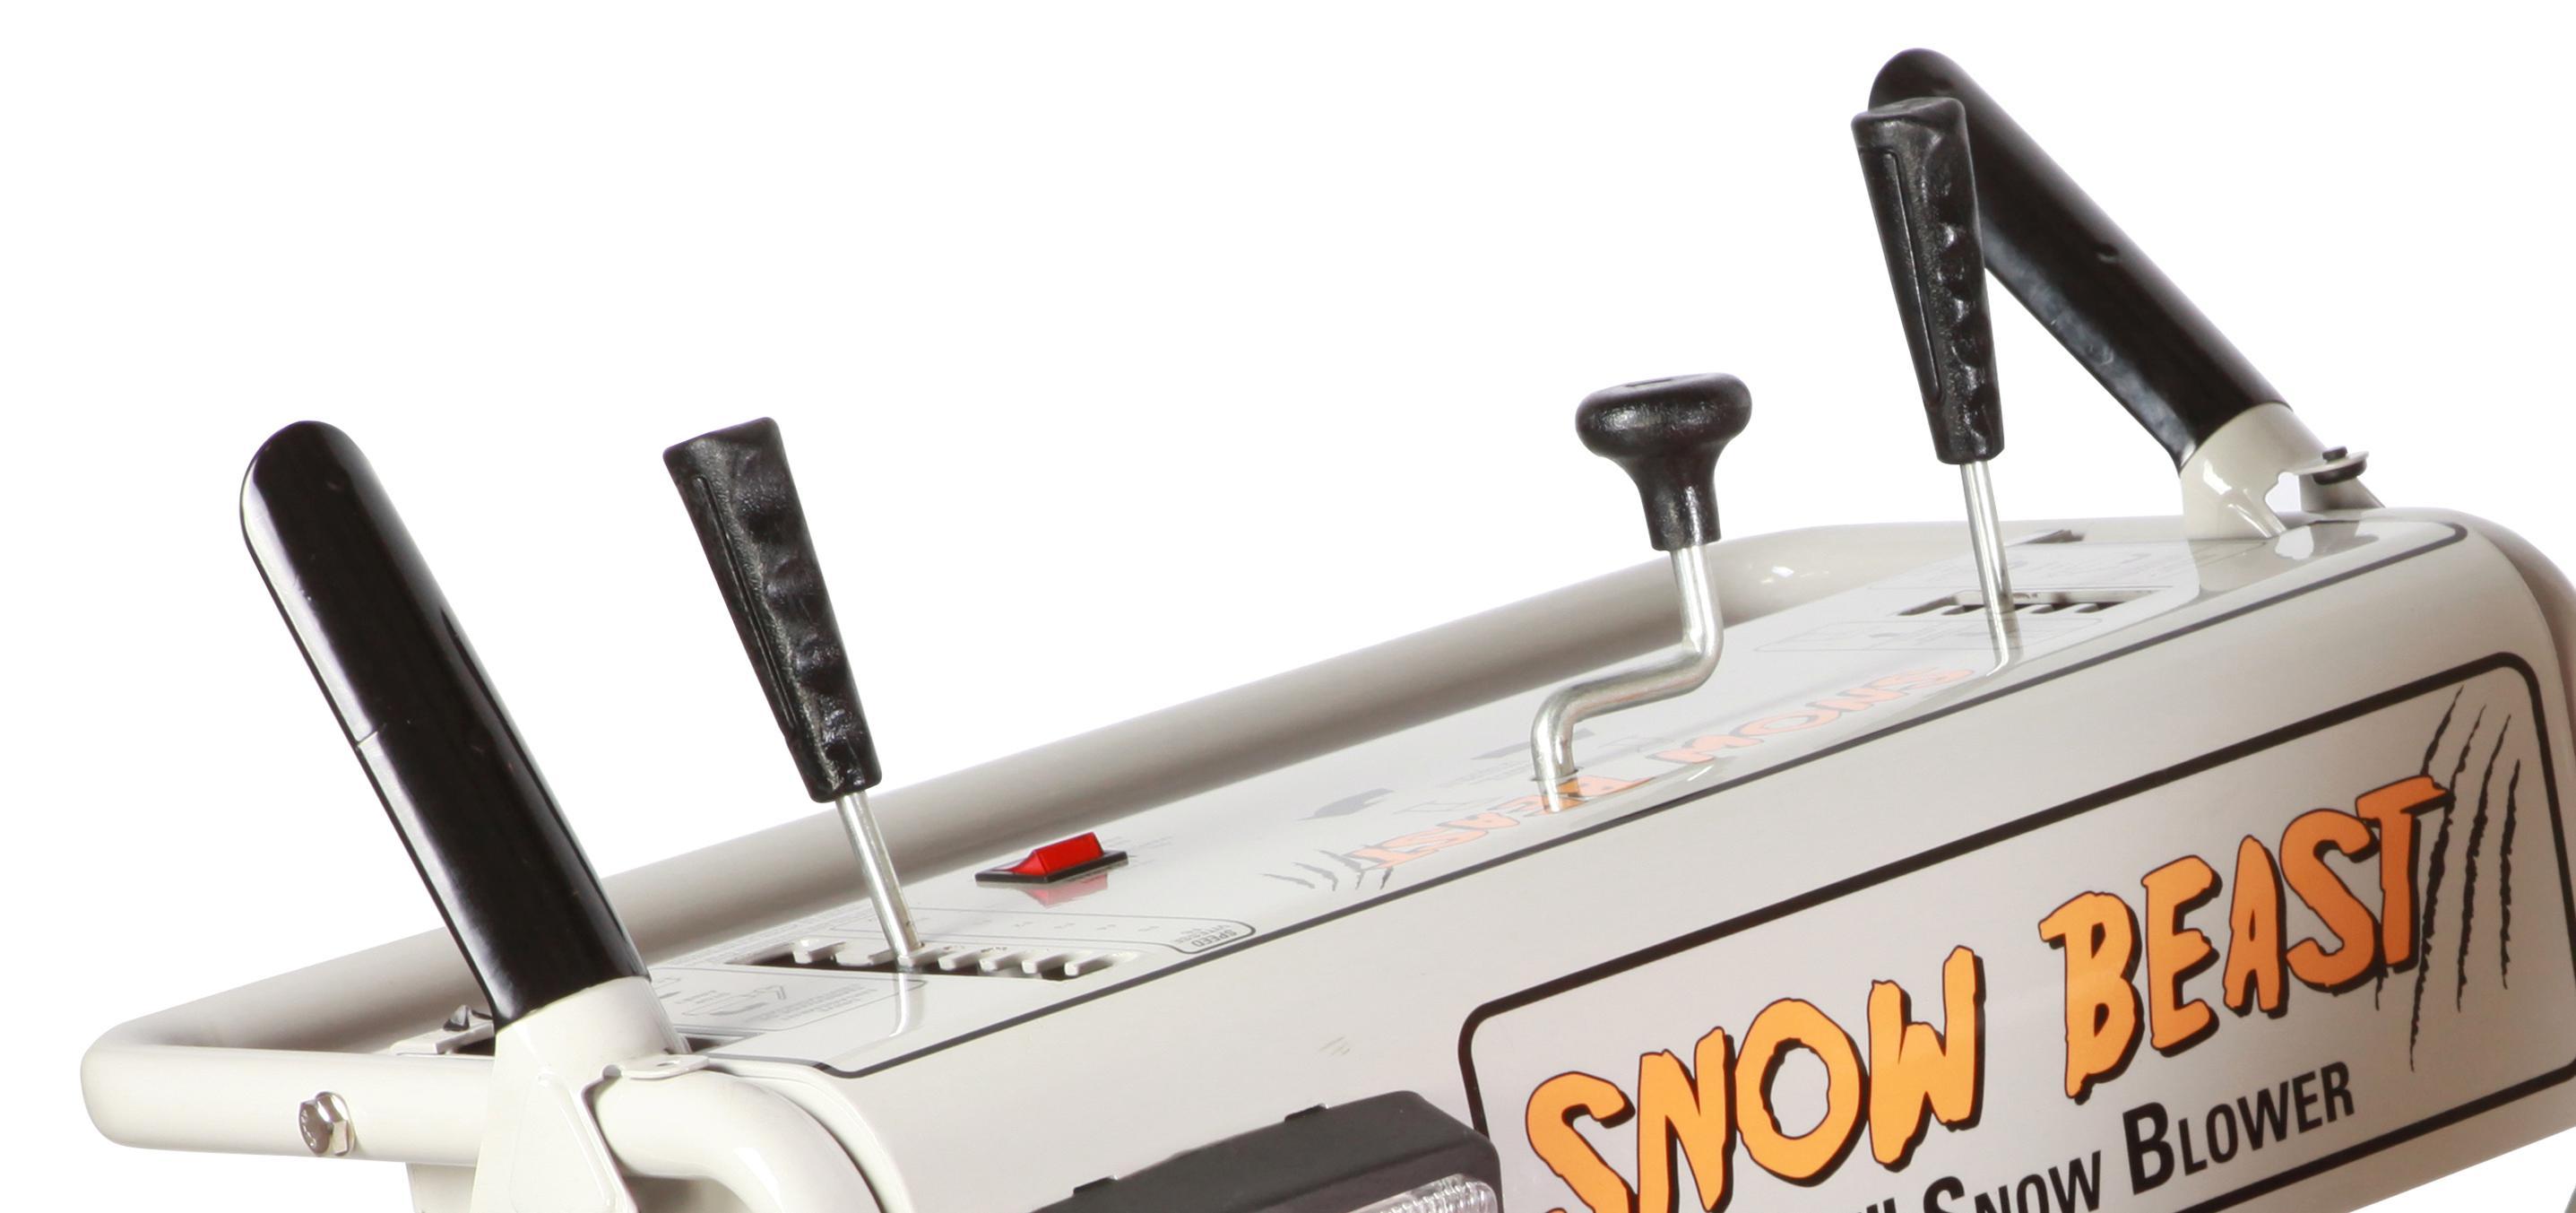 Snow Beast Snow Blower - Hand Control Detail